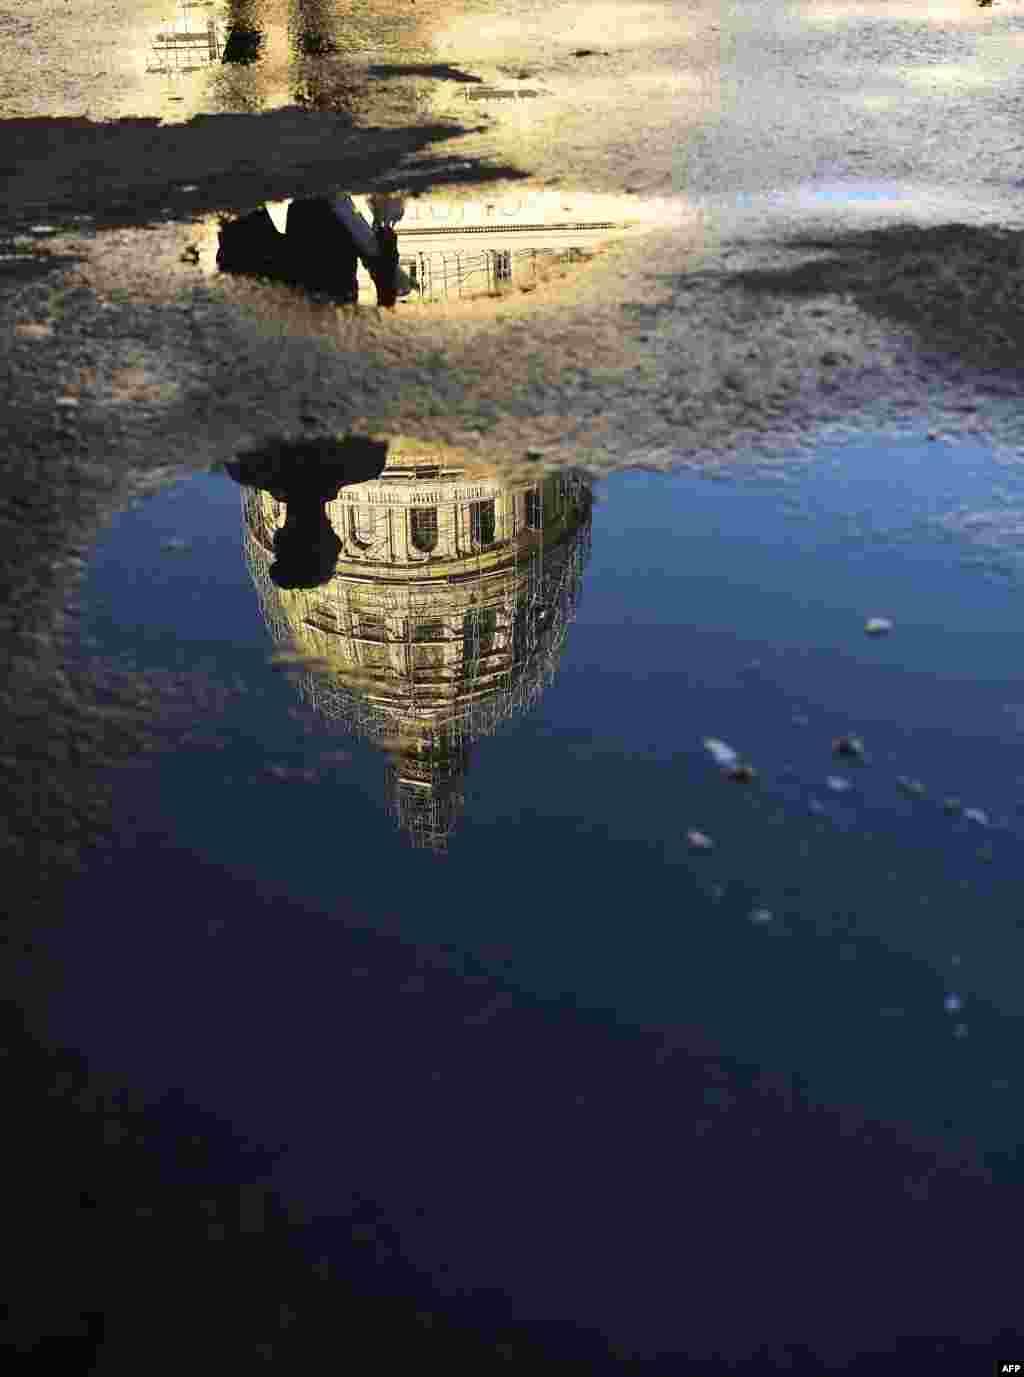 Reflejo del Capitolio. AFP PHOTO / RONALDO SCHEMIDT